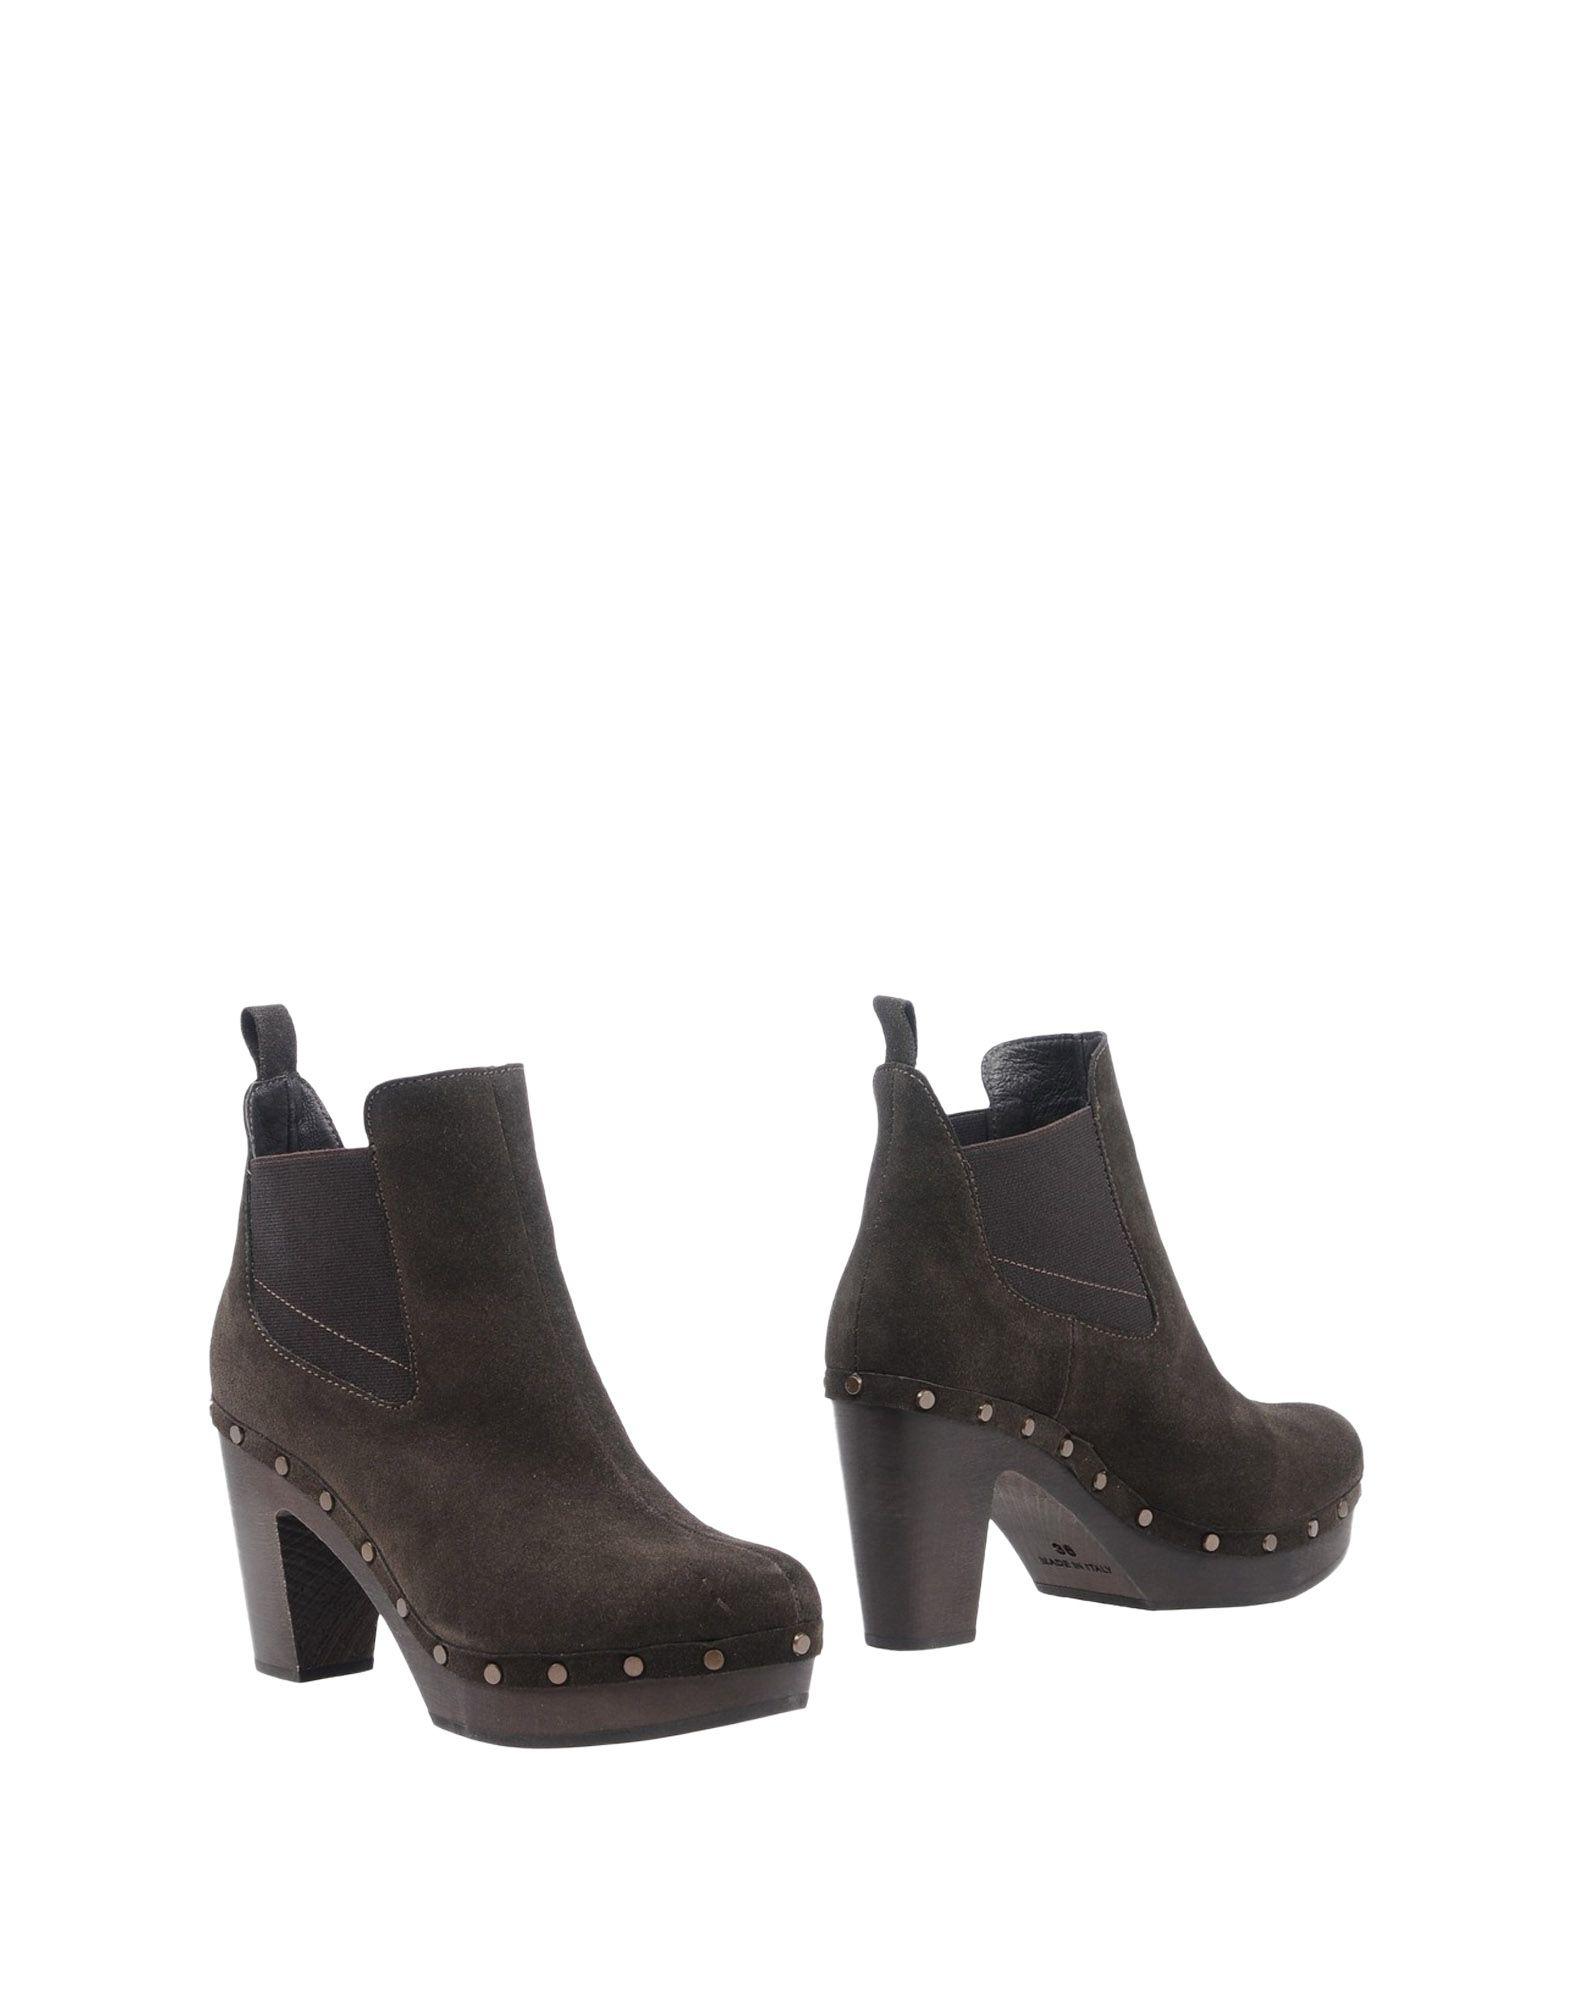 Stilvolle billige Schuhe Argila Chelsea Boots Damen  11457896KW 11457896KW 11457896KW e2dc64